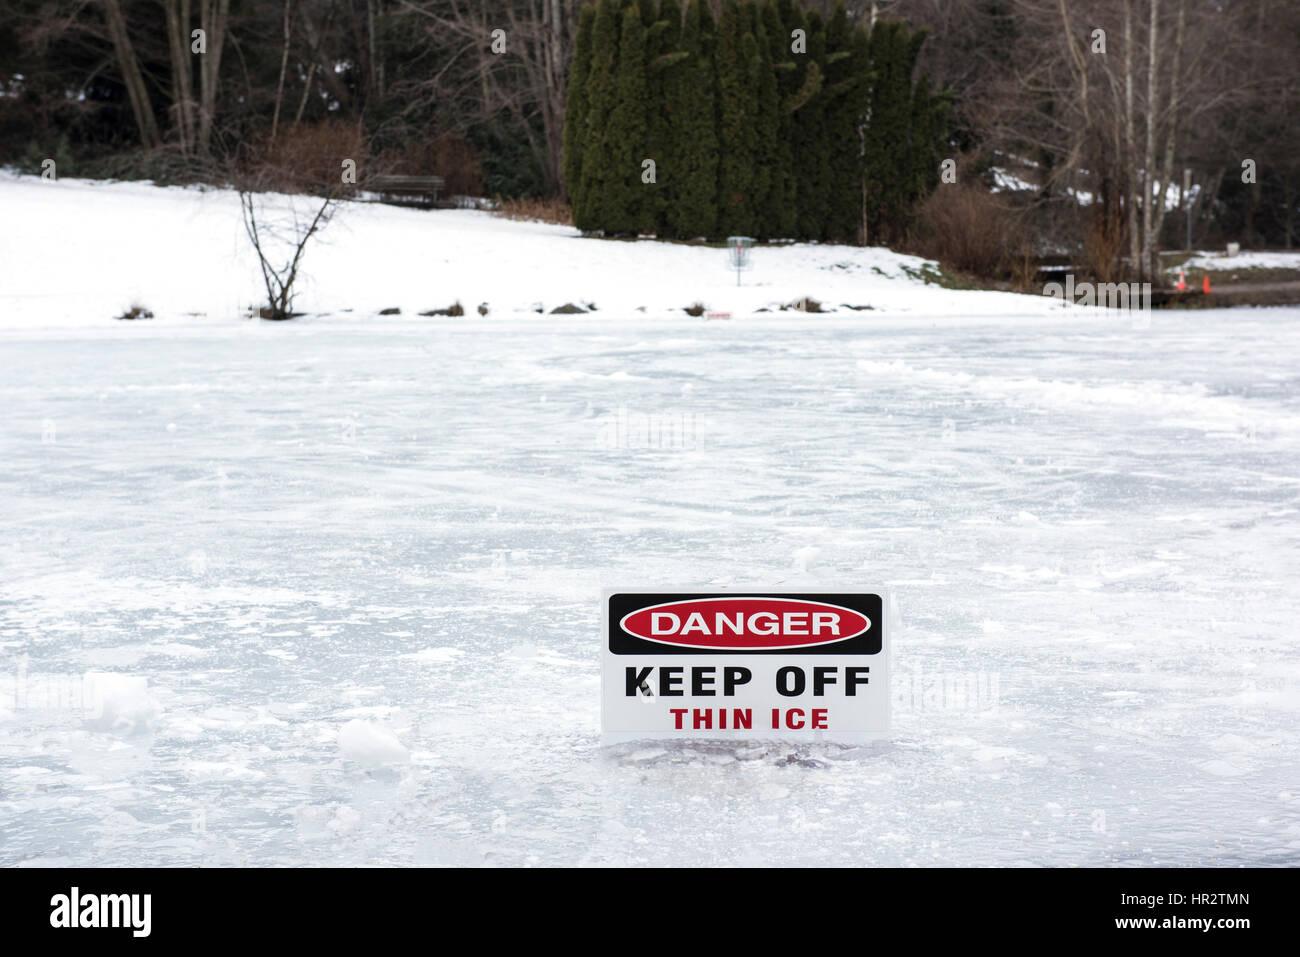 Sign warning of thin ice. - Stock Image